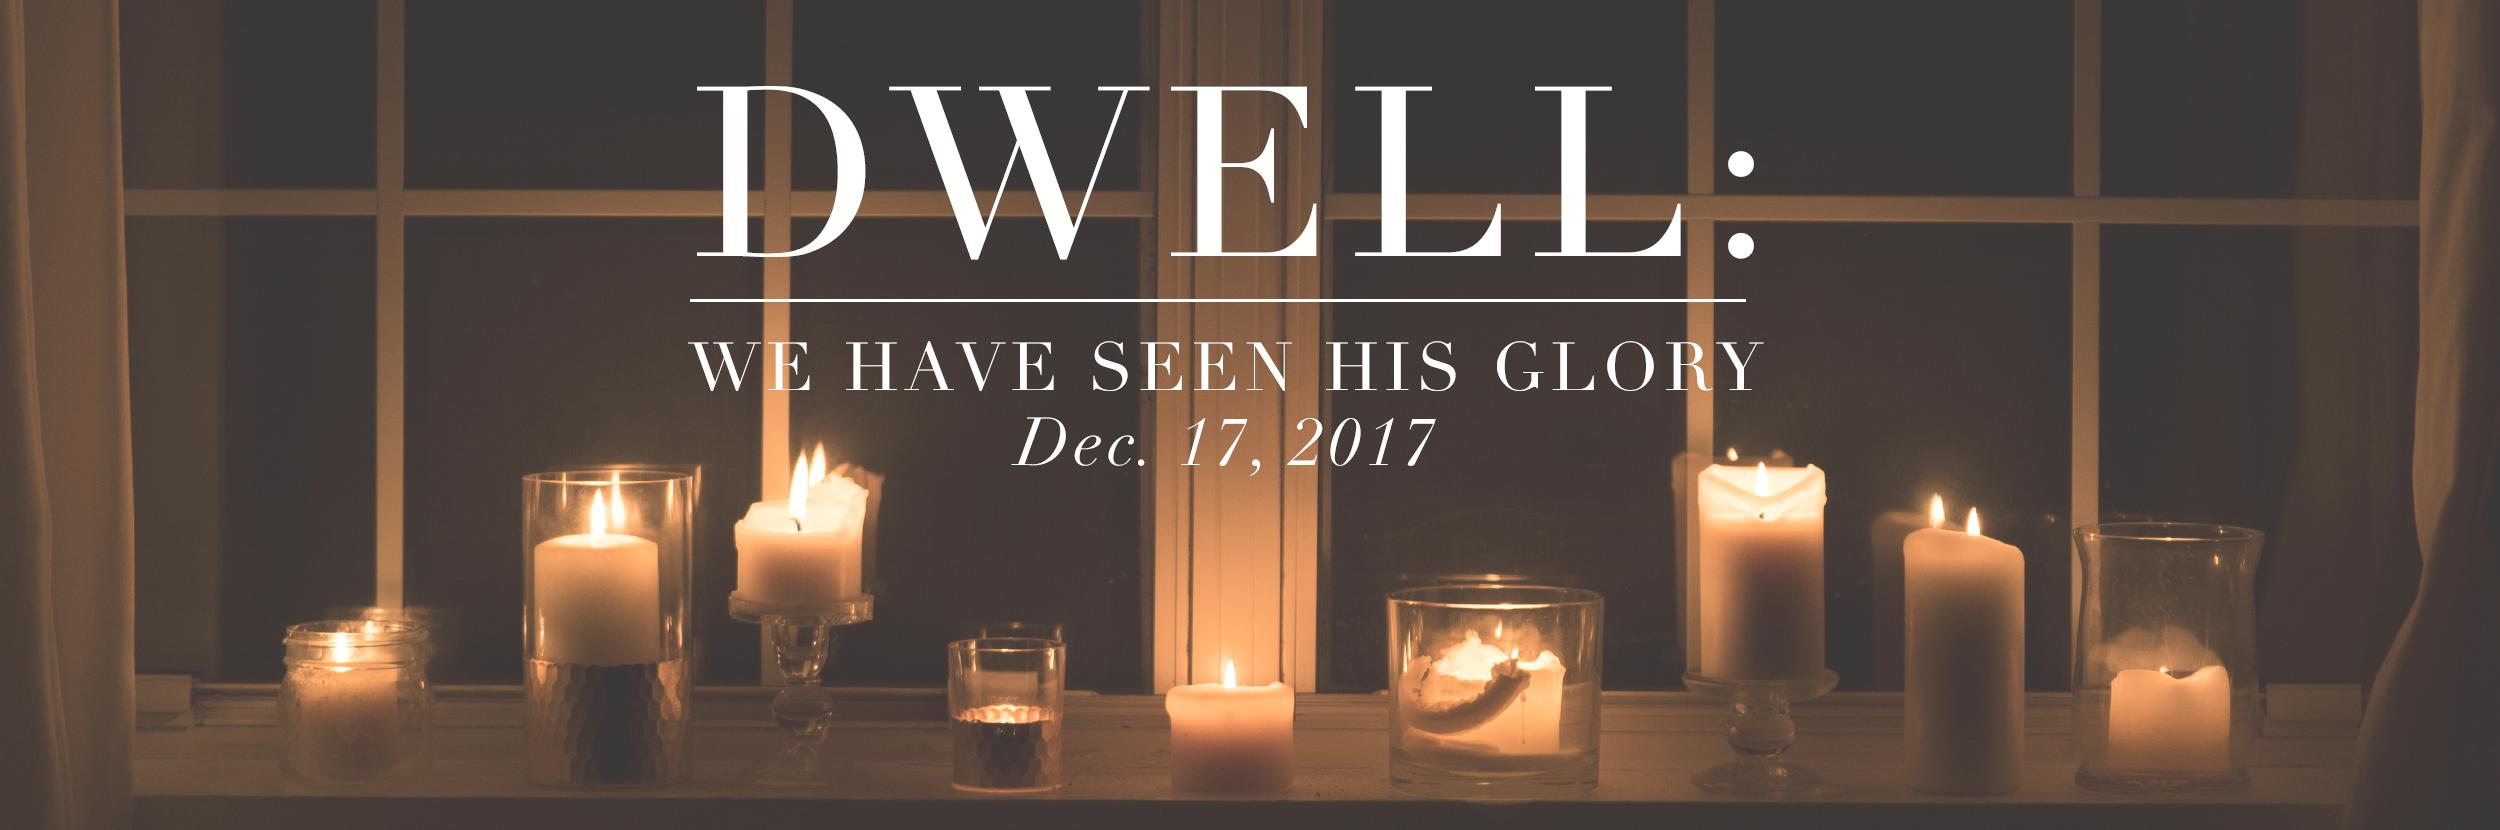 3. Dwell Banenr_Weekly Glory.png